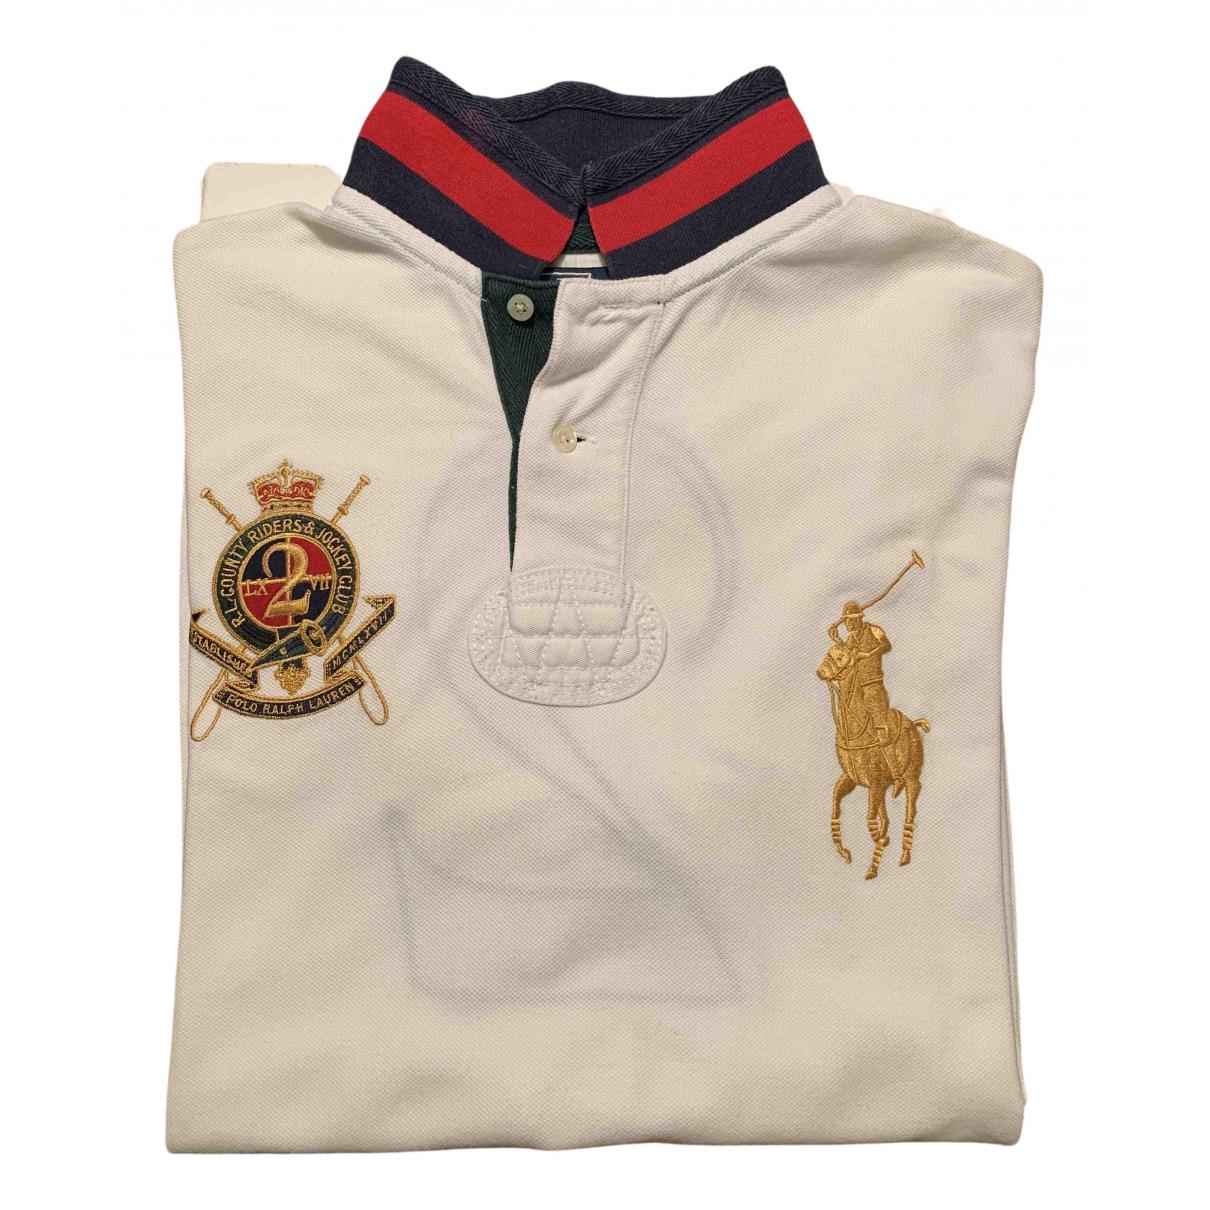 Polo Ralph Lauren - Polos Polo Rugby manches longues pour homme en coton - blanc